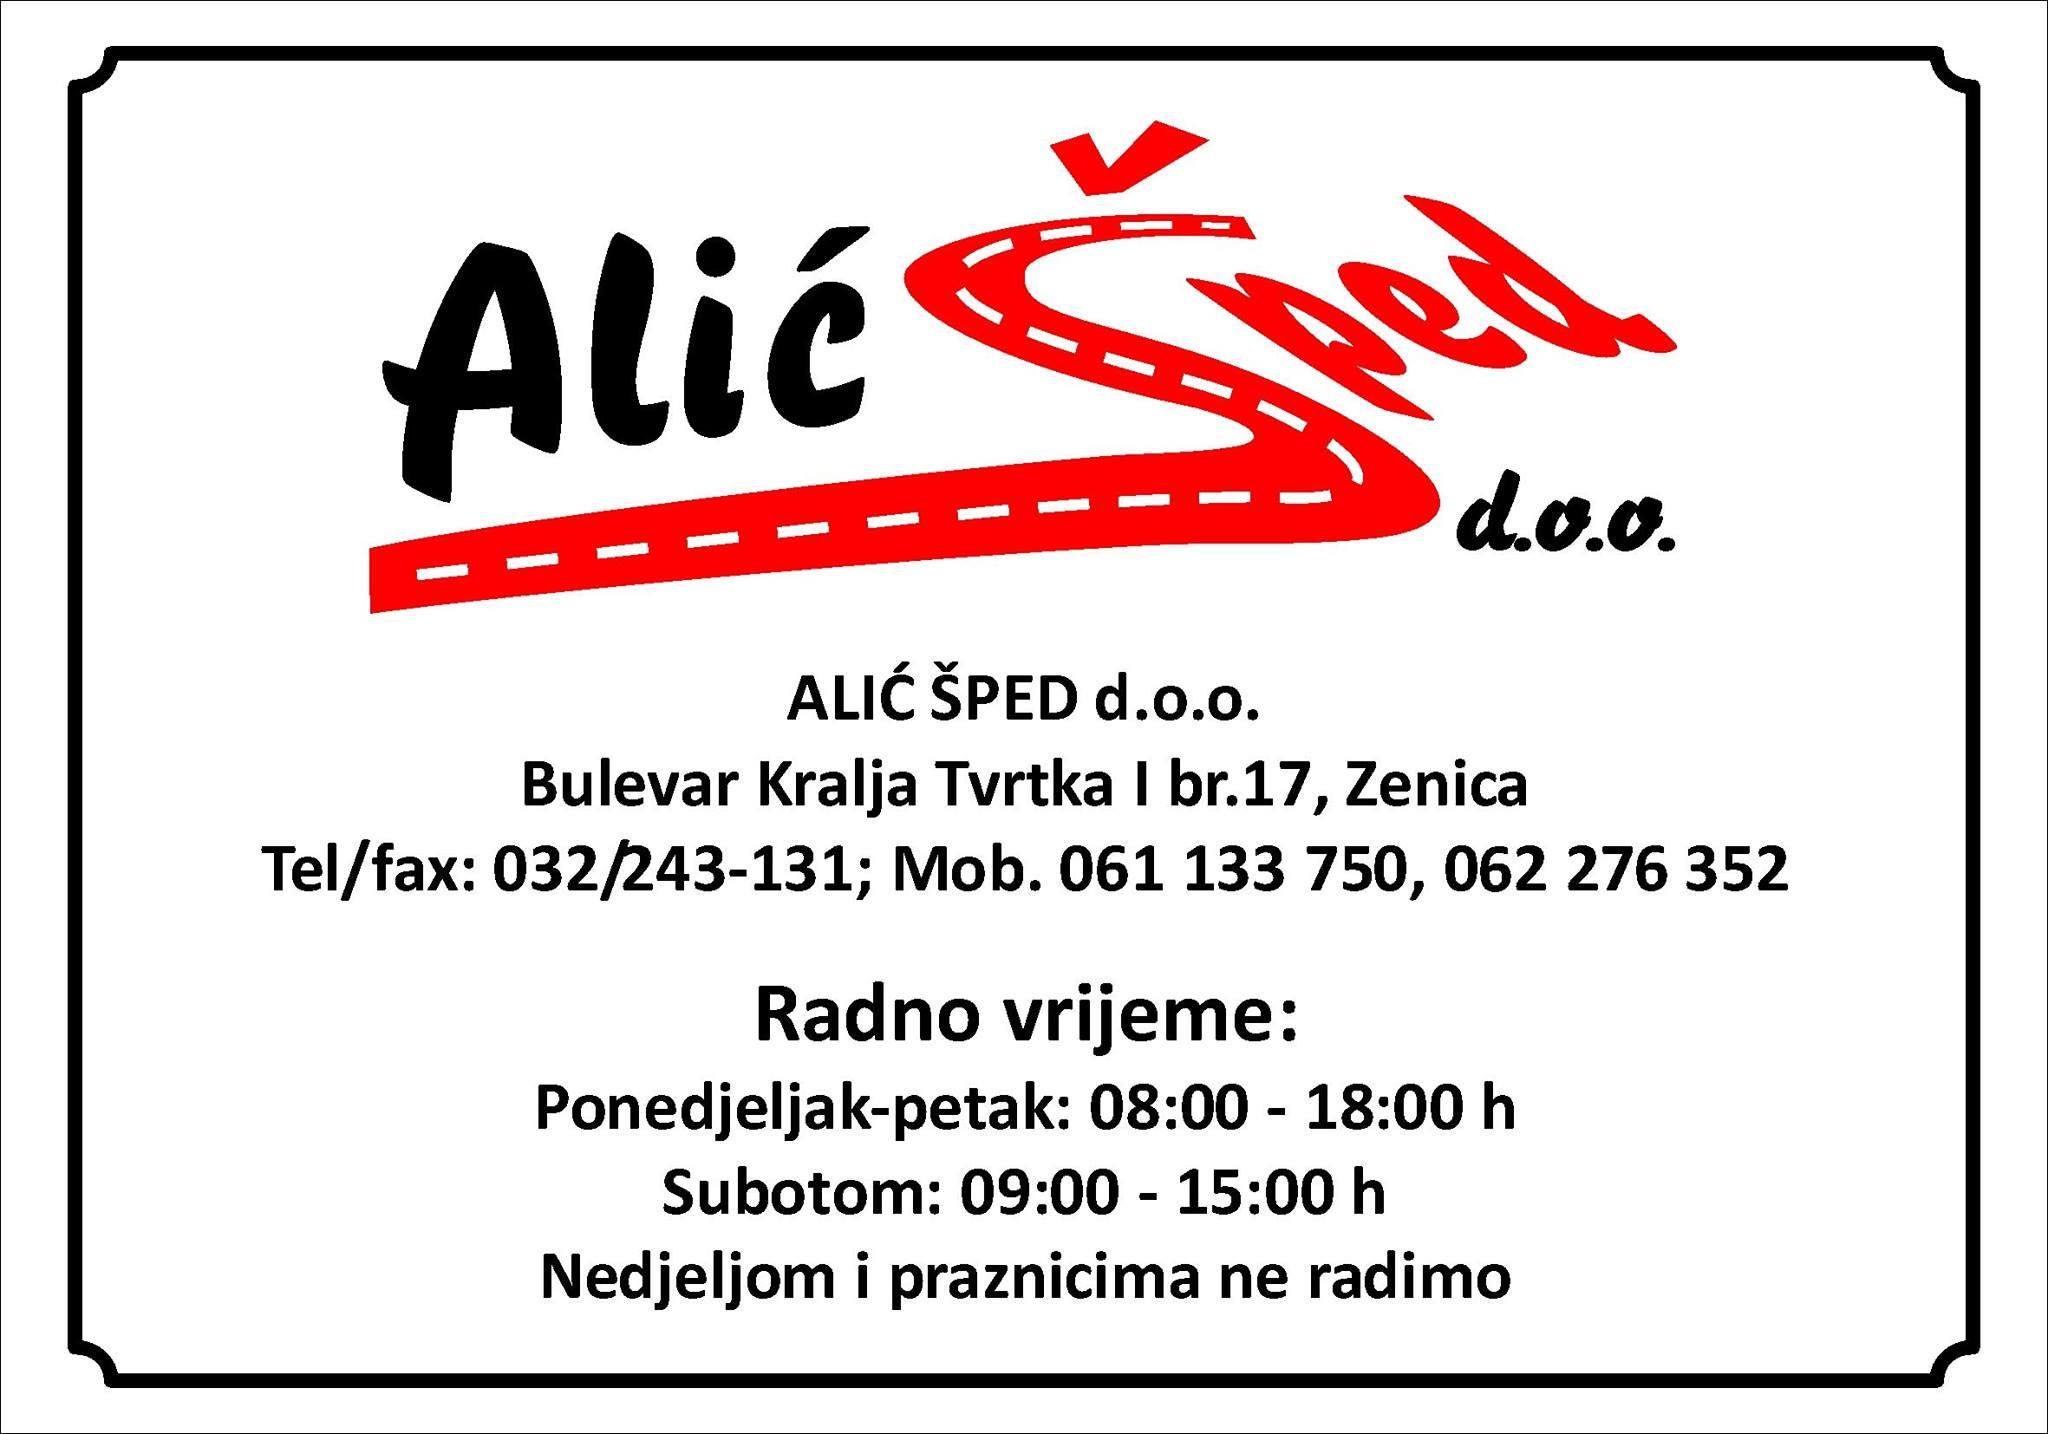 Alic Sped